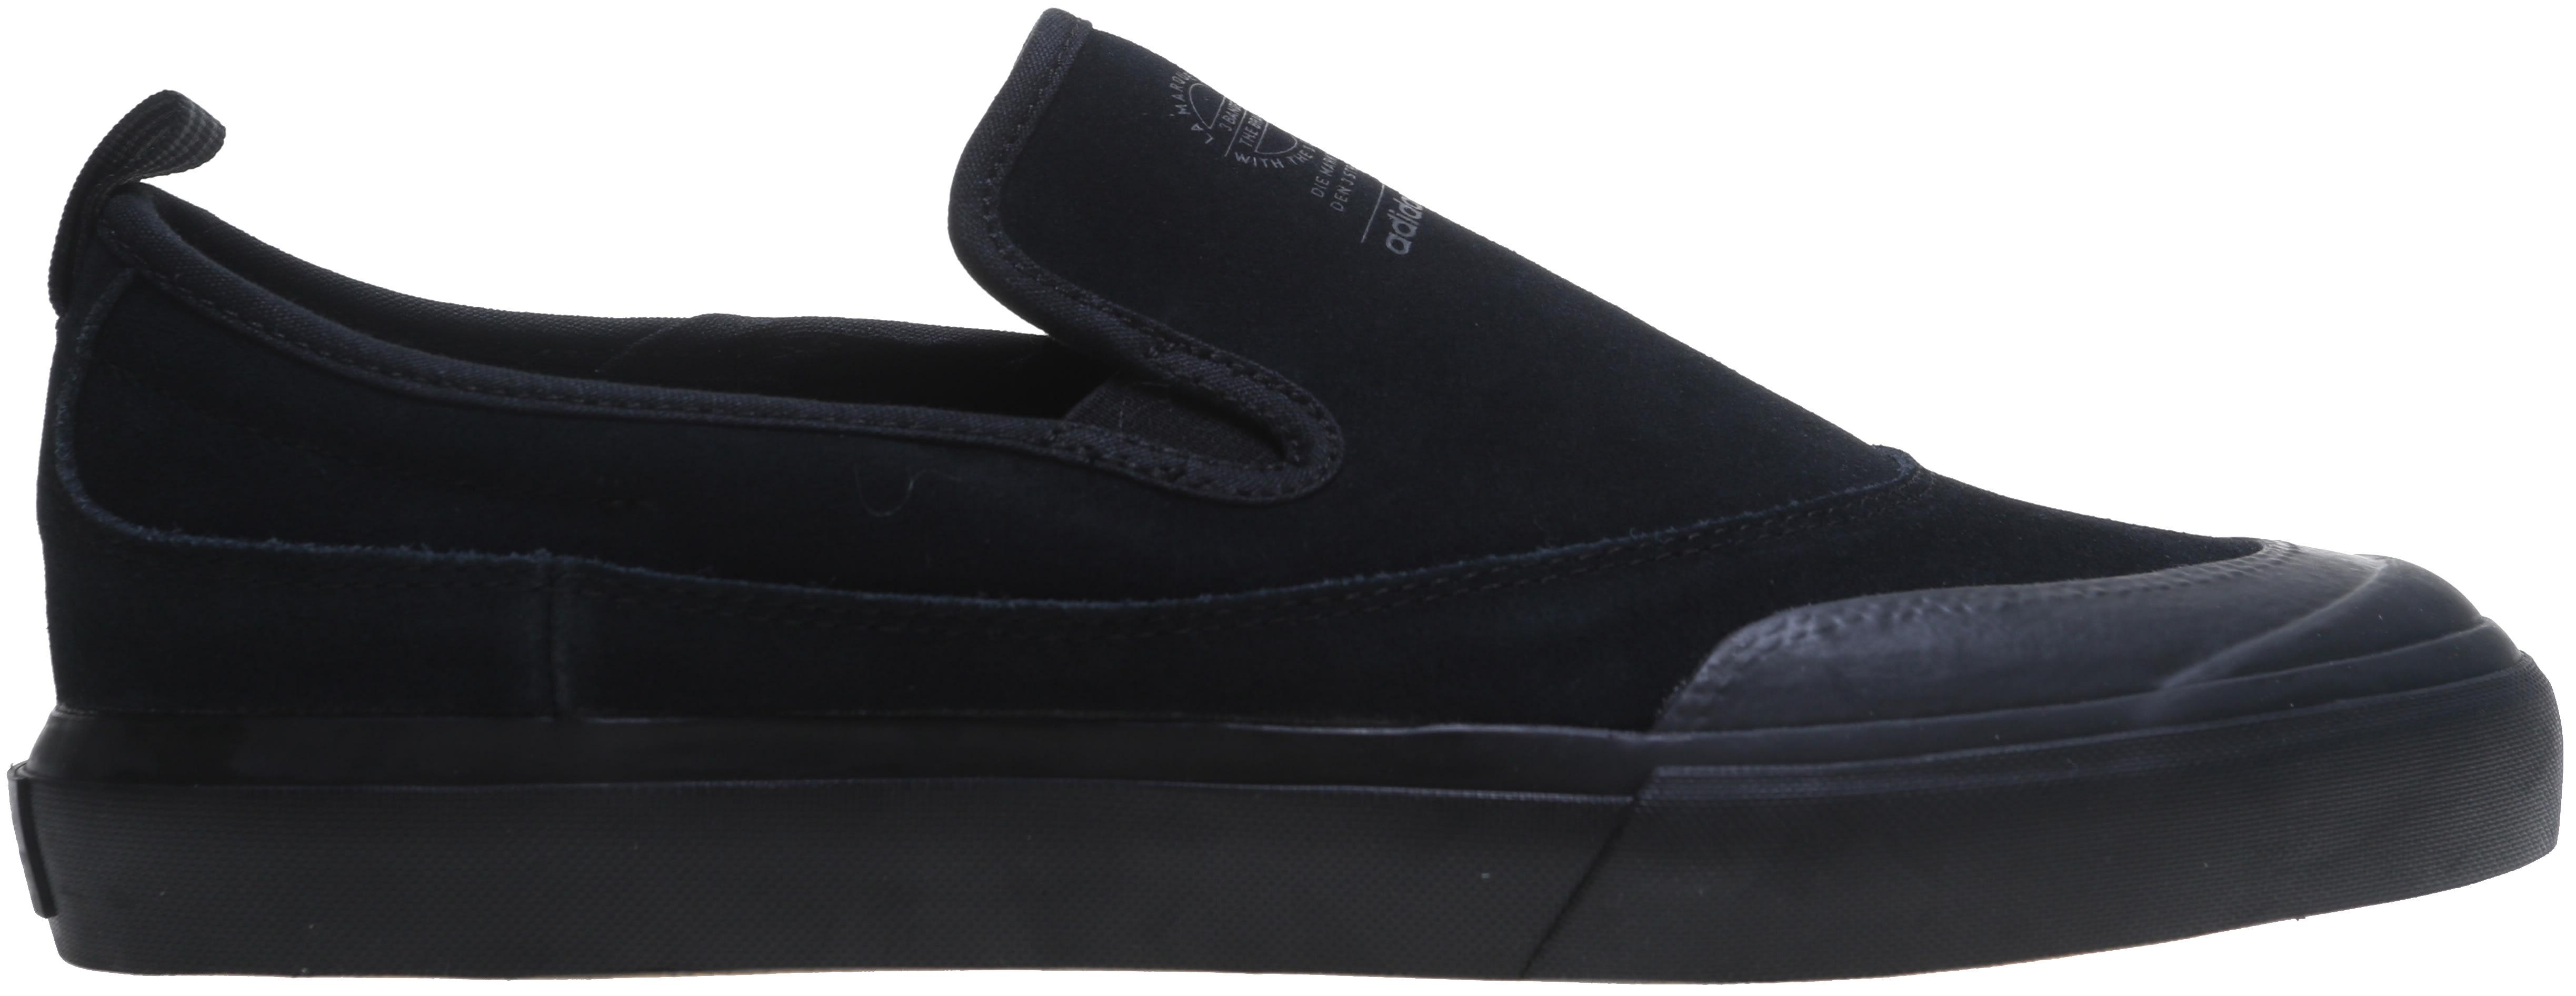 7476fd6bfca Adidas Matchcourt Slip Skate Shoes - thumbnail 1